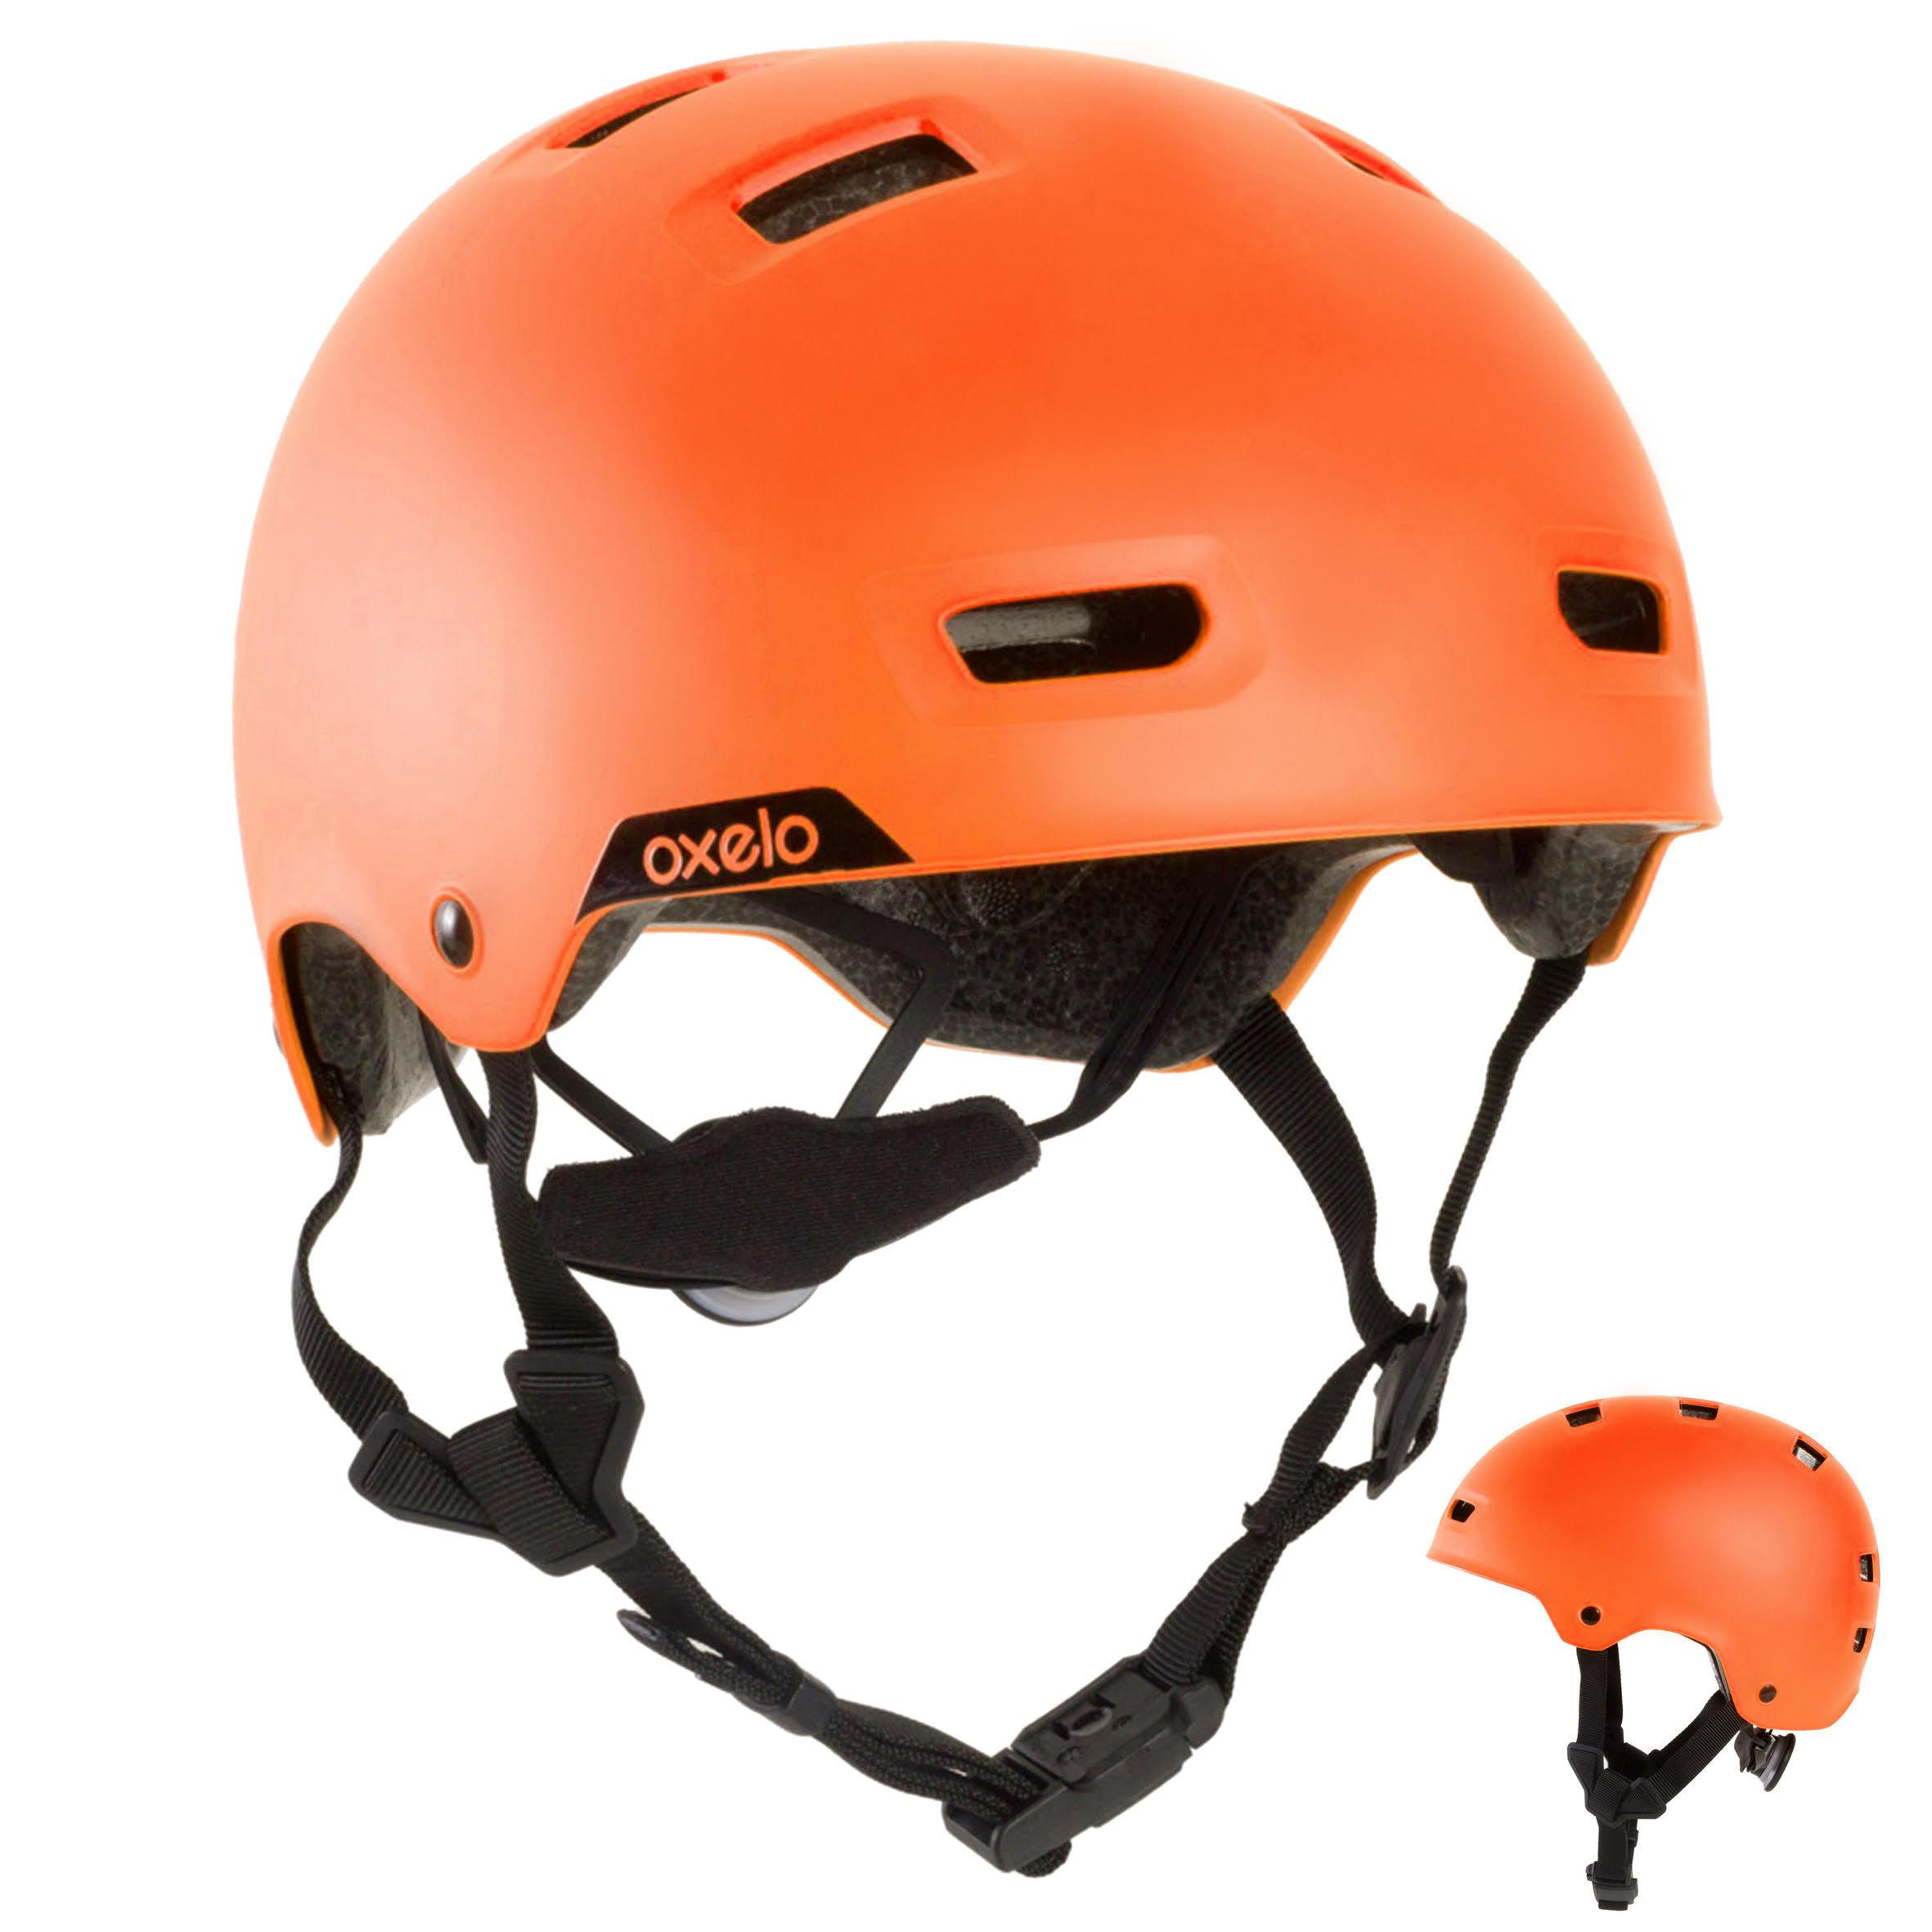 Skating Skateboarding Scootering Helmet MF540 - Neon Orange - 59-62cm By OXELO | Decathlon